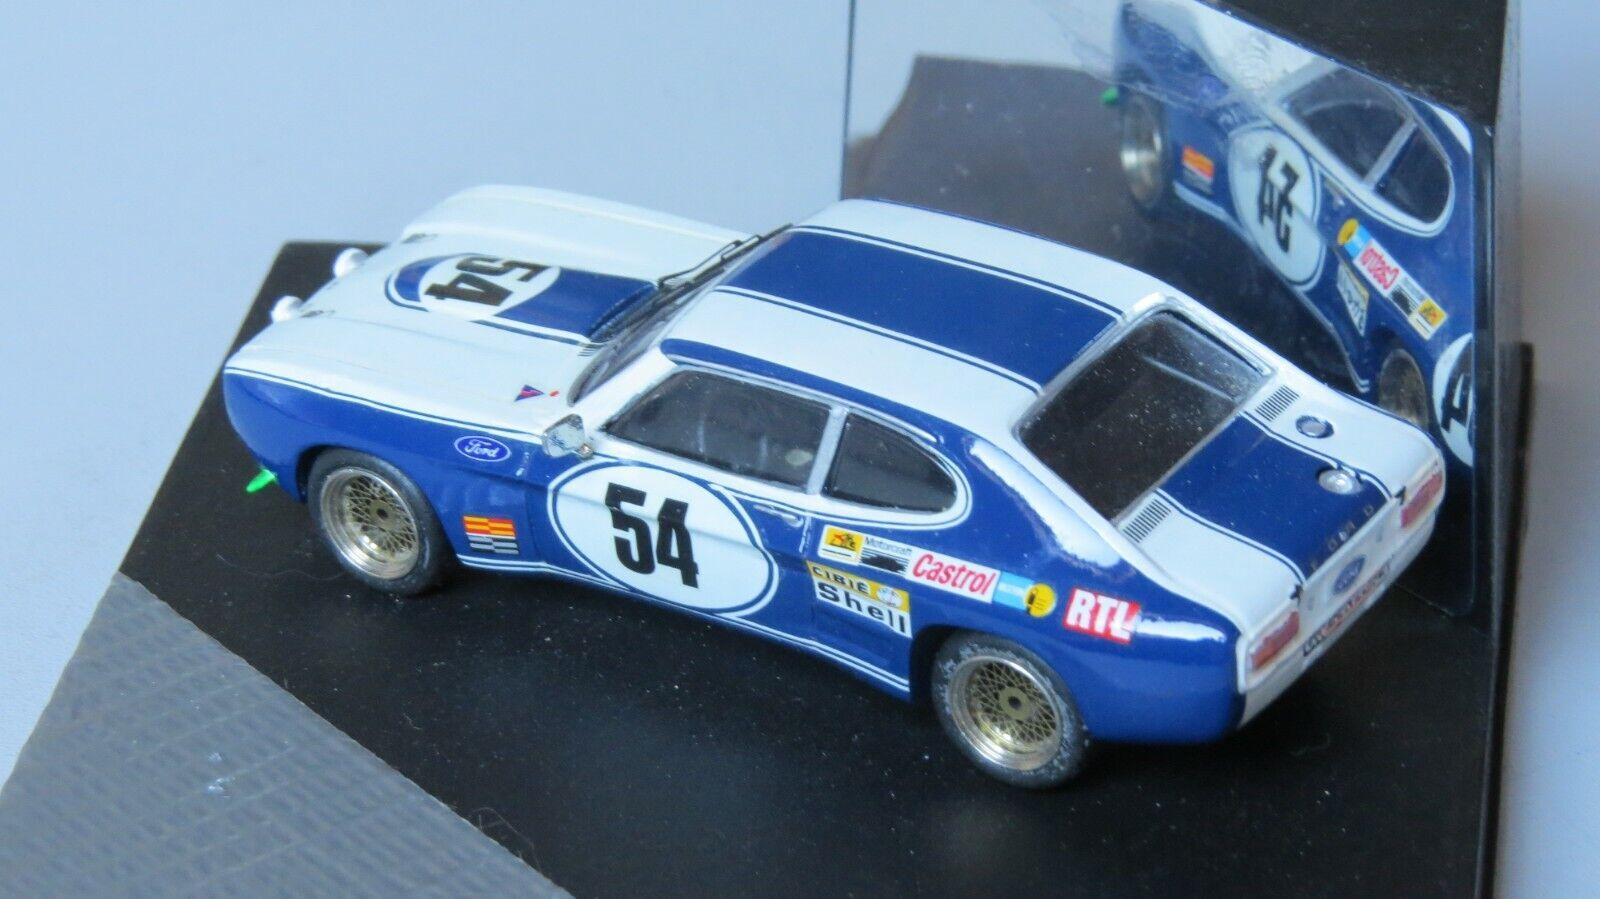 Miniature 1 43Ford Capri Le Mans 72 G.Byrrell C.Bourgoignie Kit résine Mini Raci